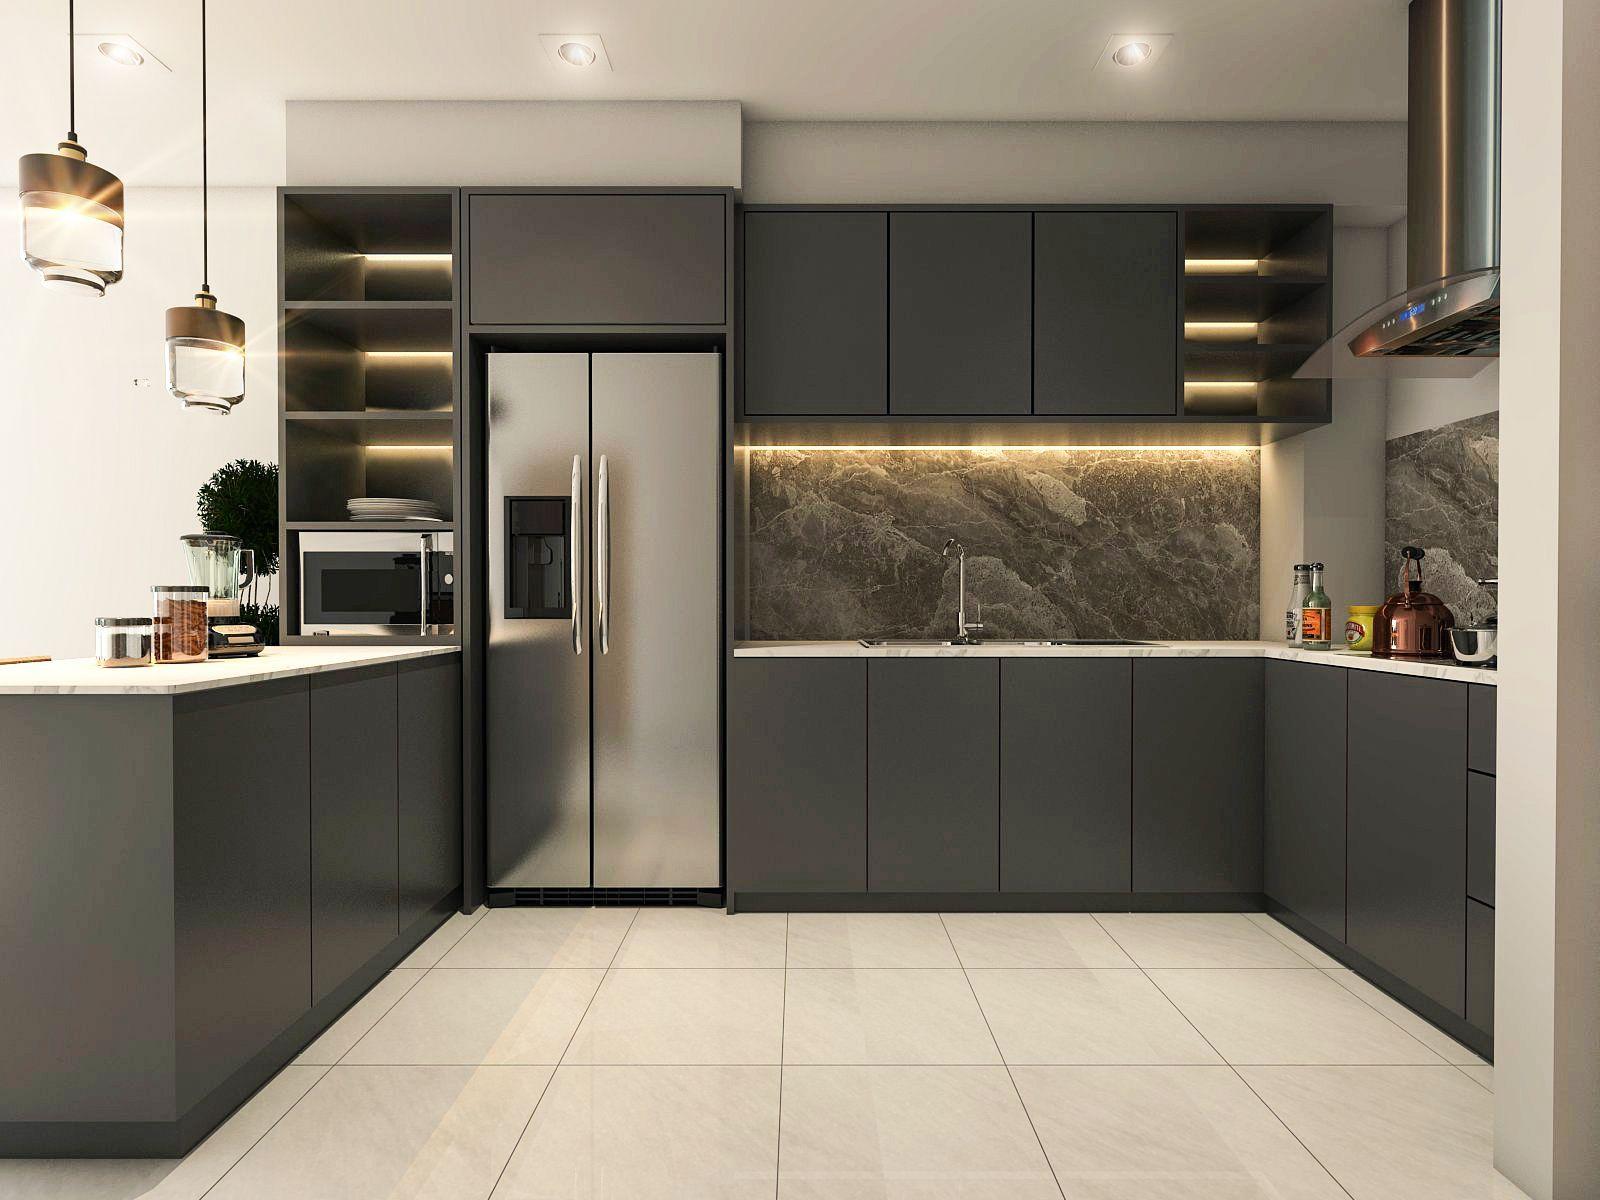 Aprenda A Desenvolver Projetos De Arquitetura Realistas Kitchen Interior Kitchen Bathroom Remodel Kitchen Design